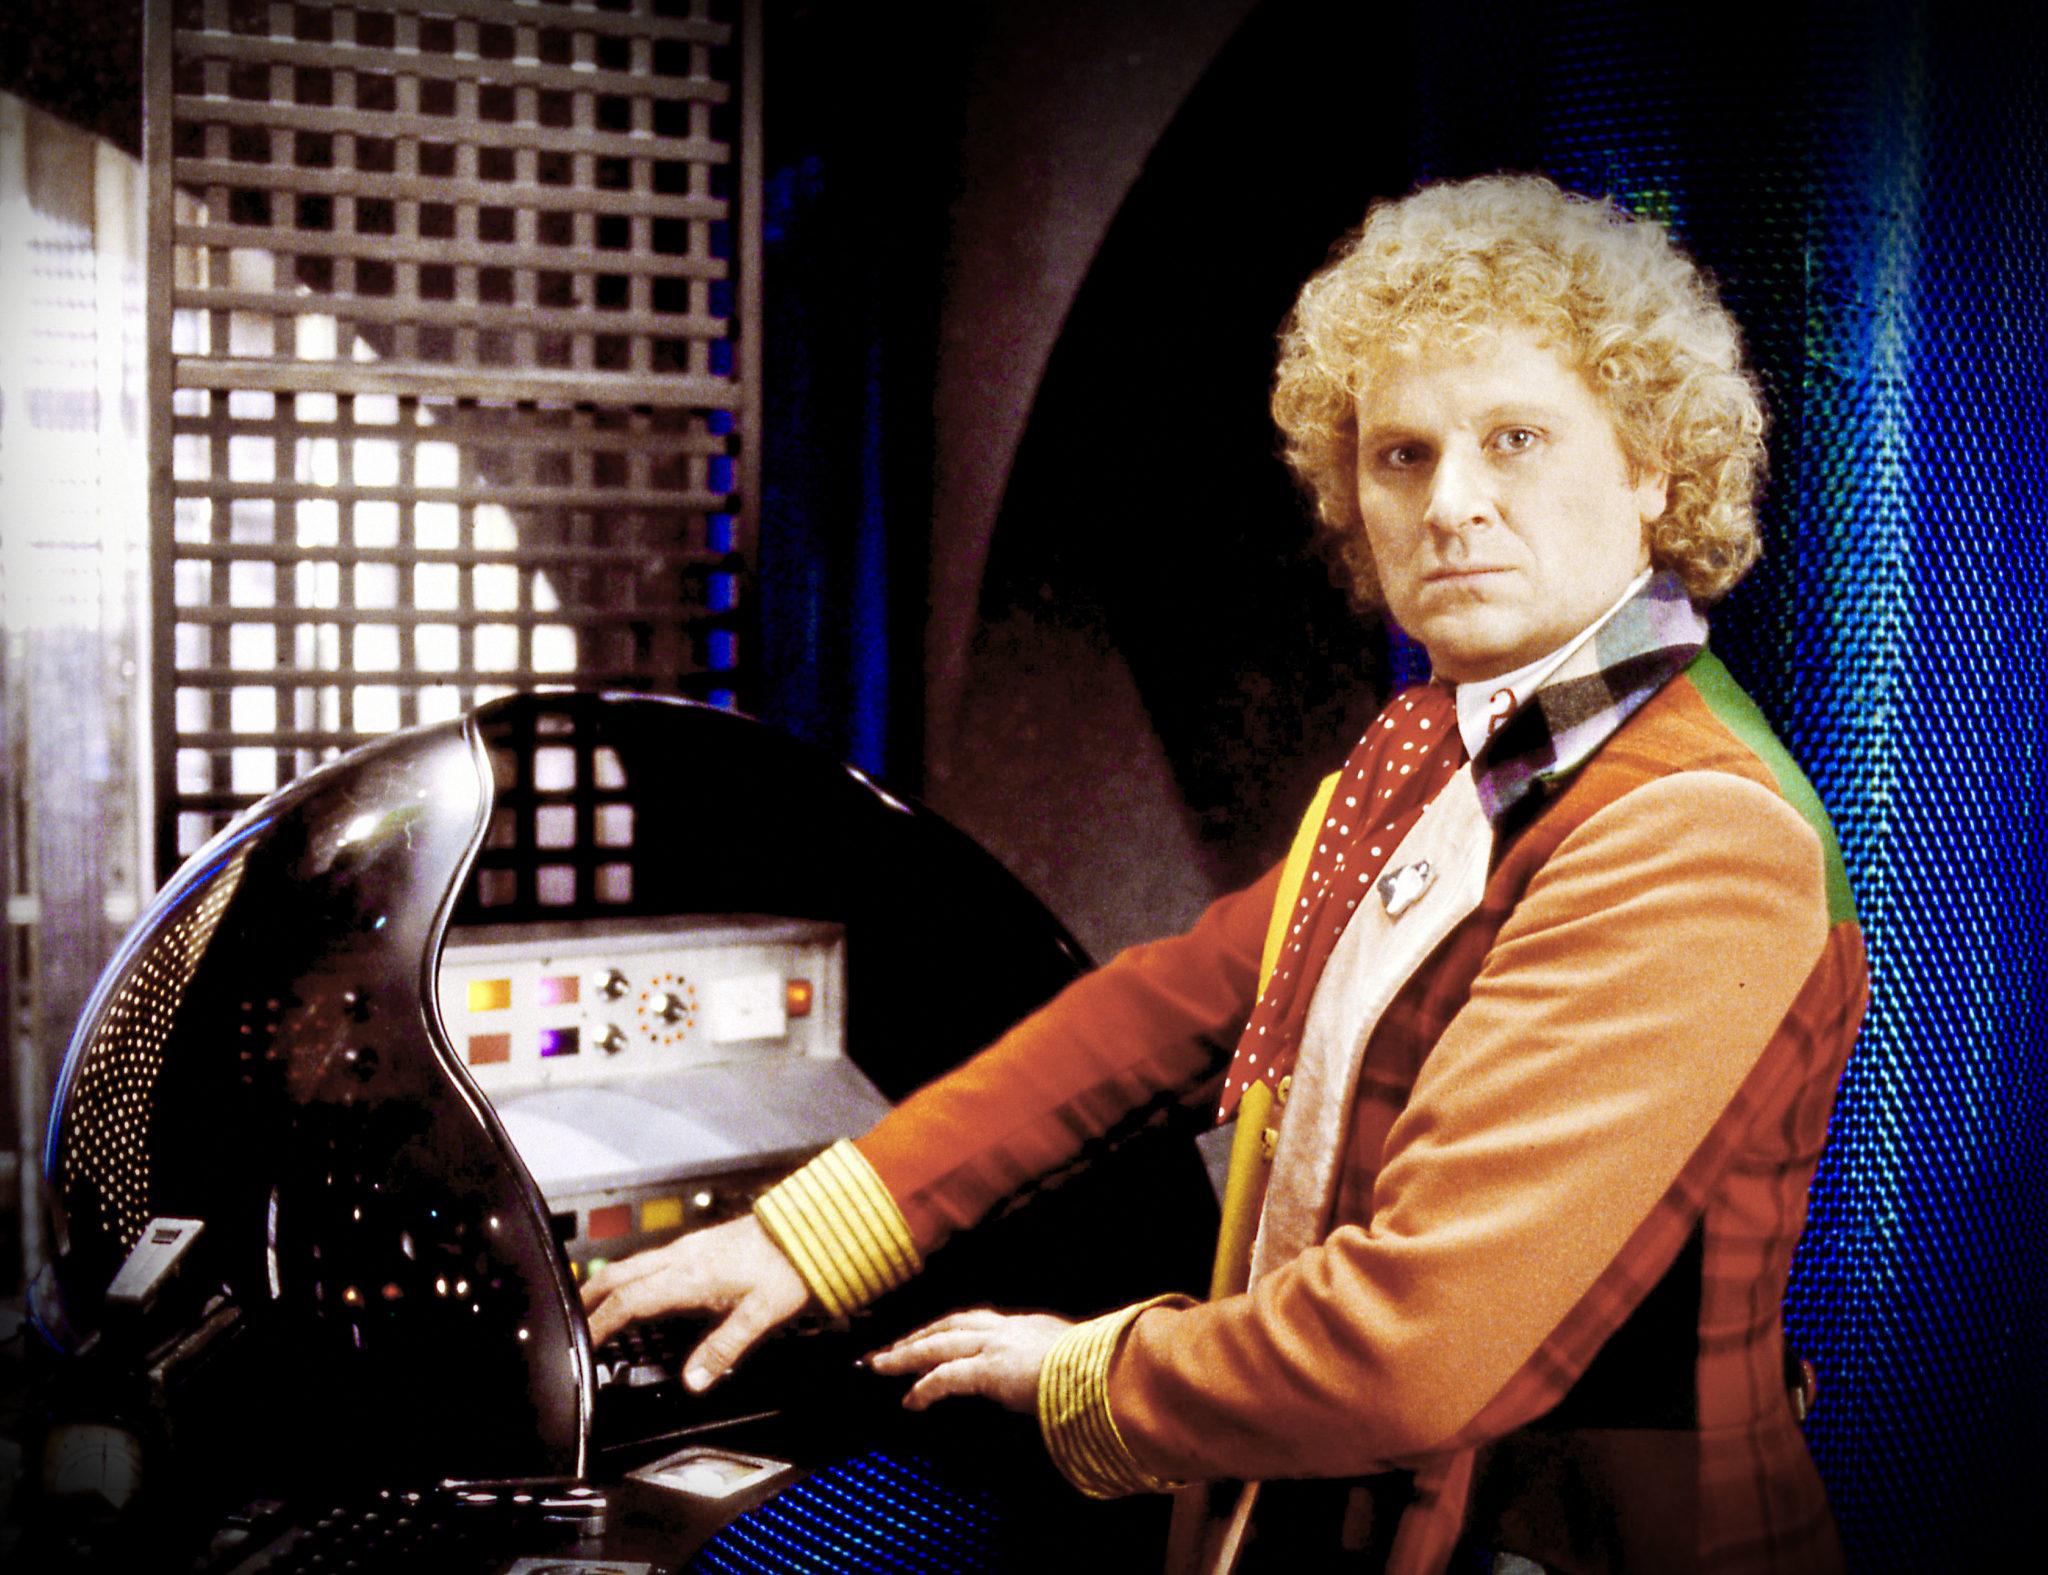 Der Doktor auf dem mysteriösen Planeten (Foto: Pandastorm Pictures/BBC)